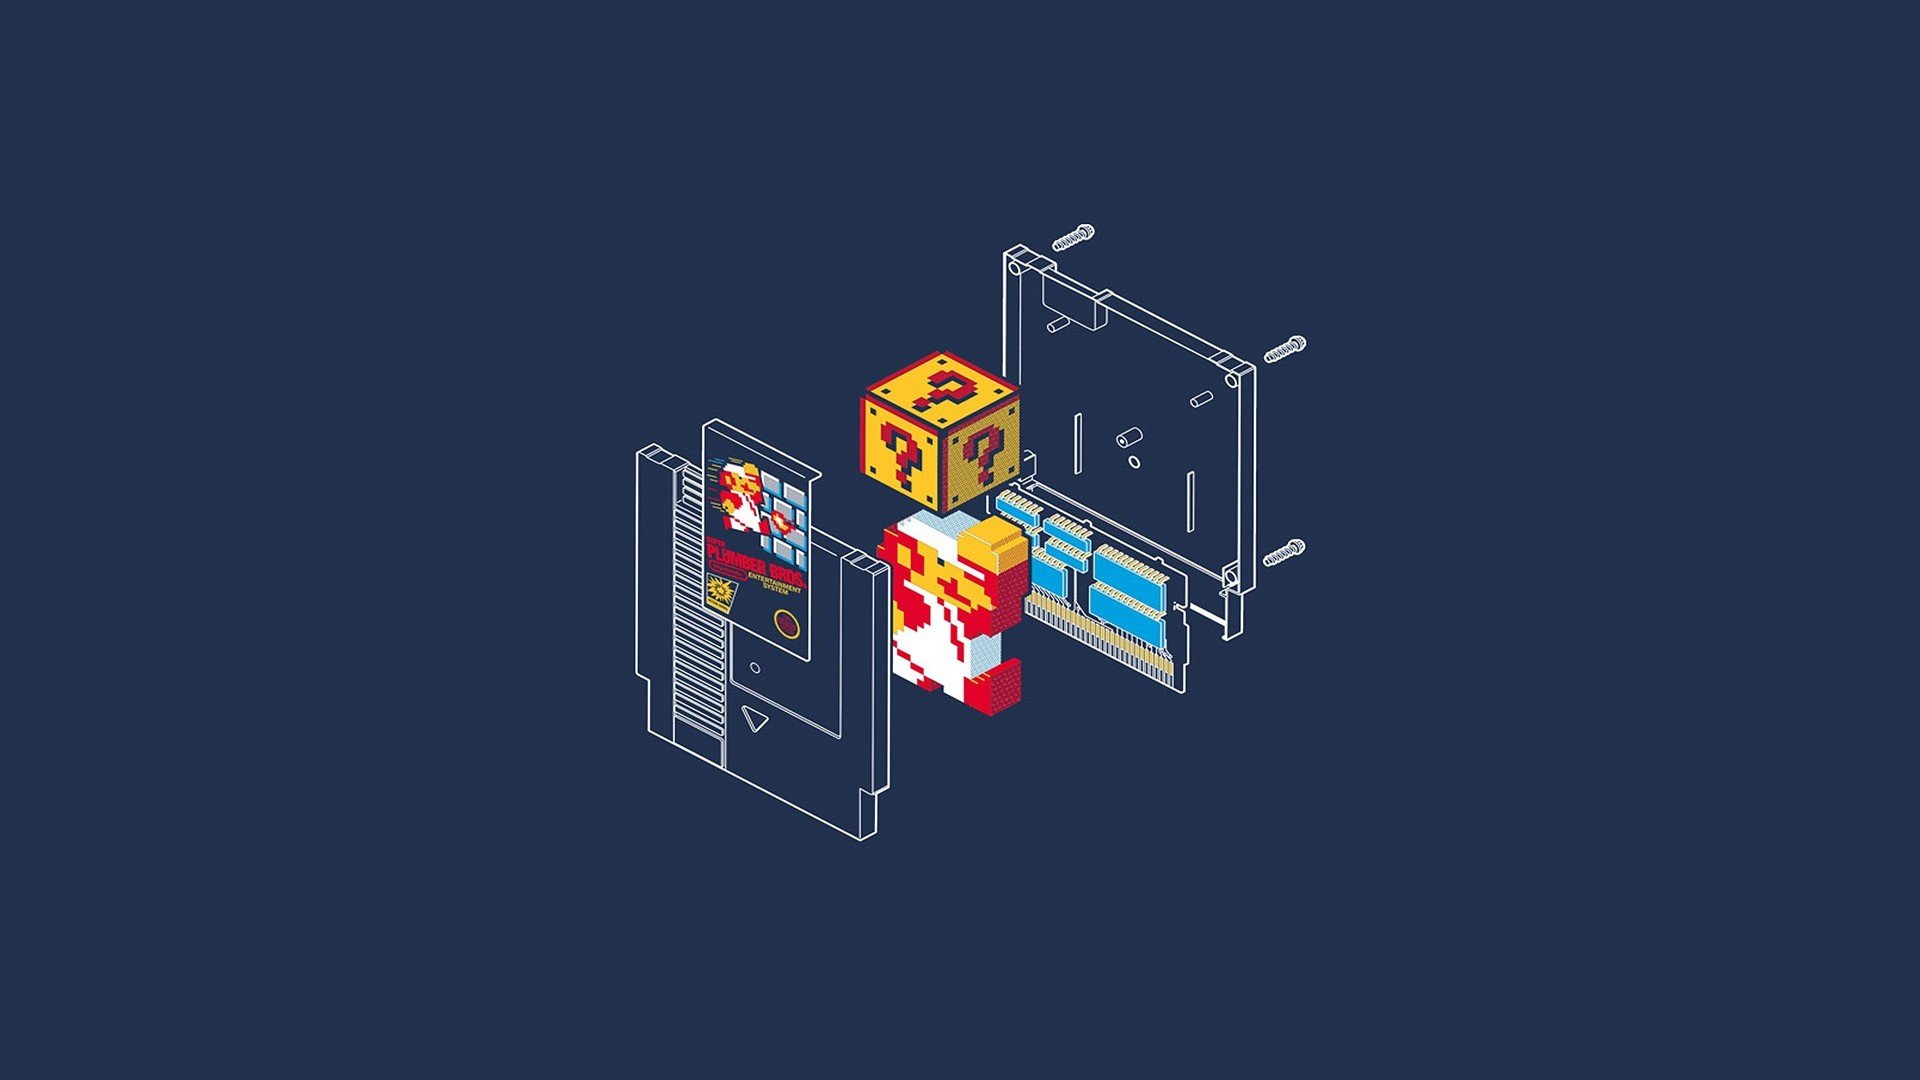 Cute Kingdom Hearts Wallpaper Super Mario Bros Minimalism Wallpapers Hd Desktop And